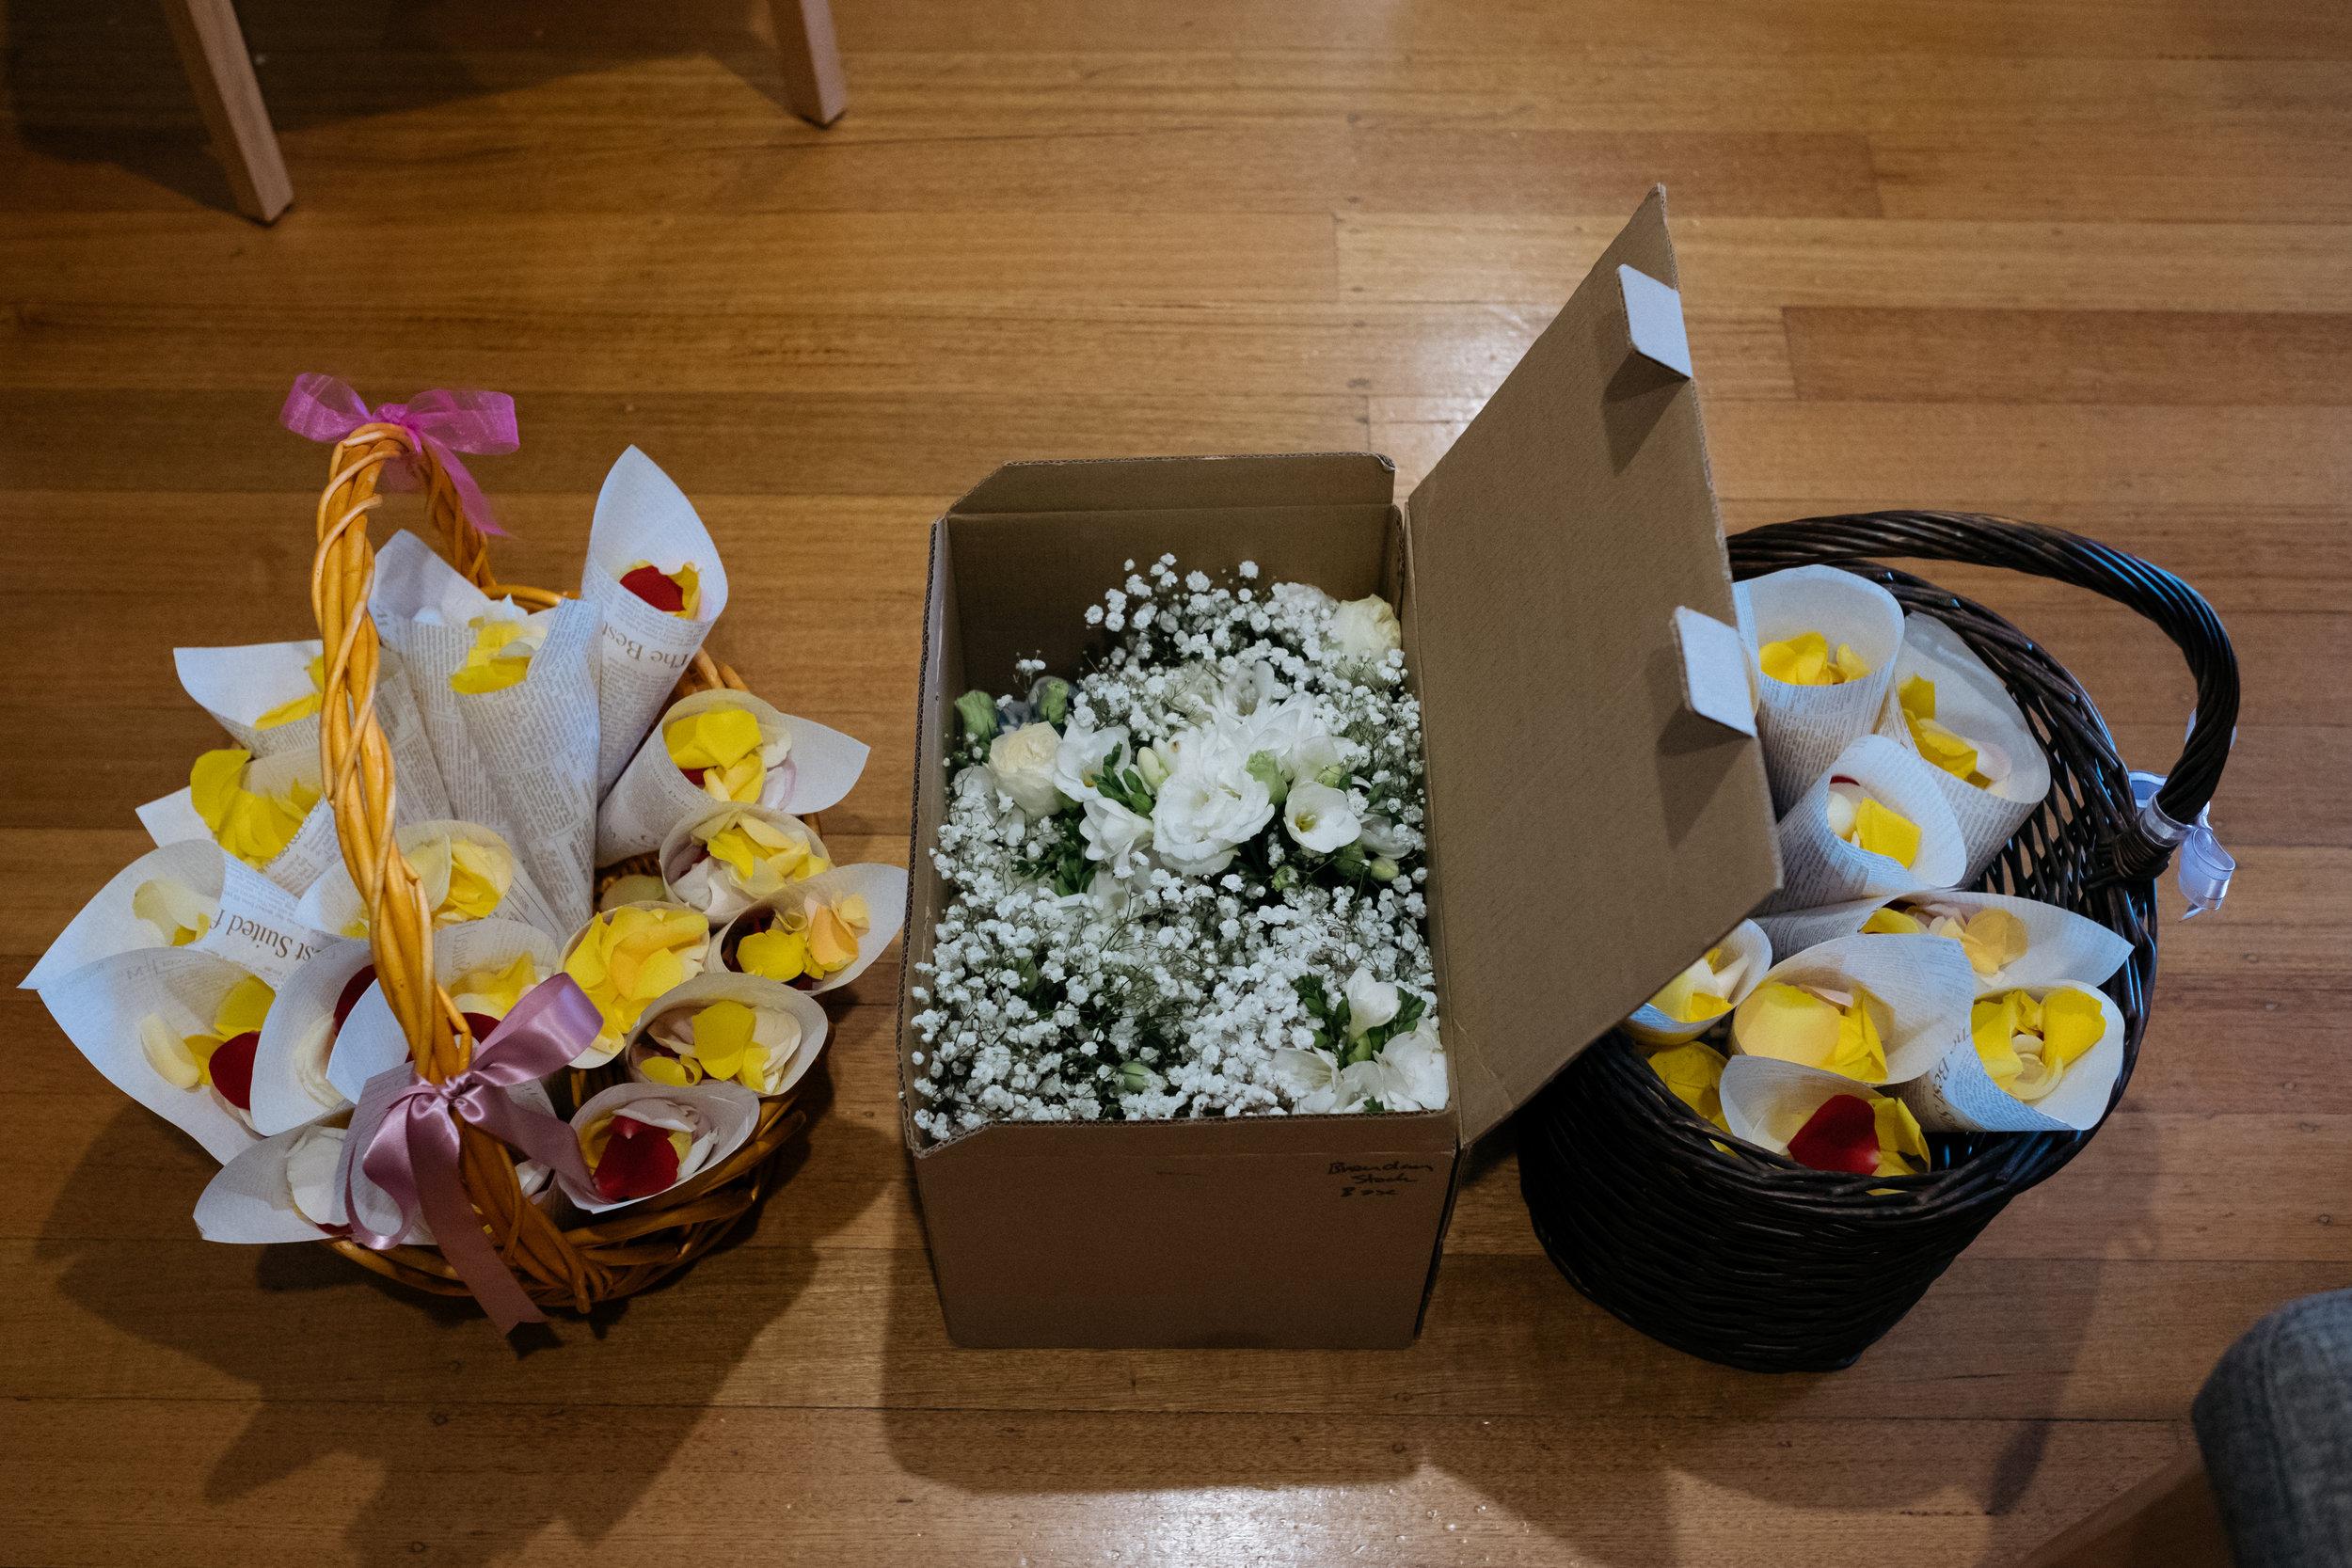 Baskets of rose petal confetti